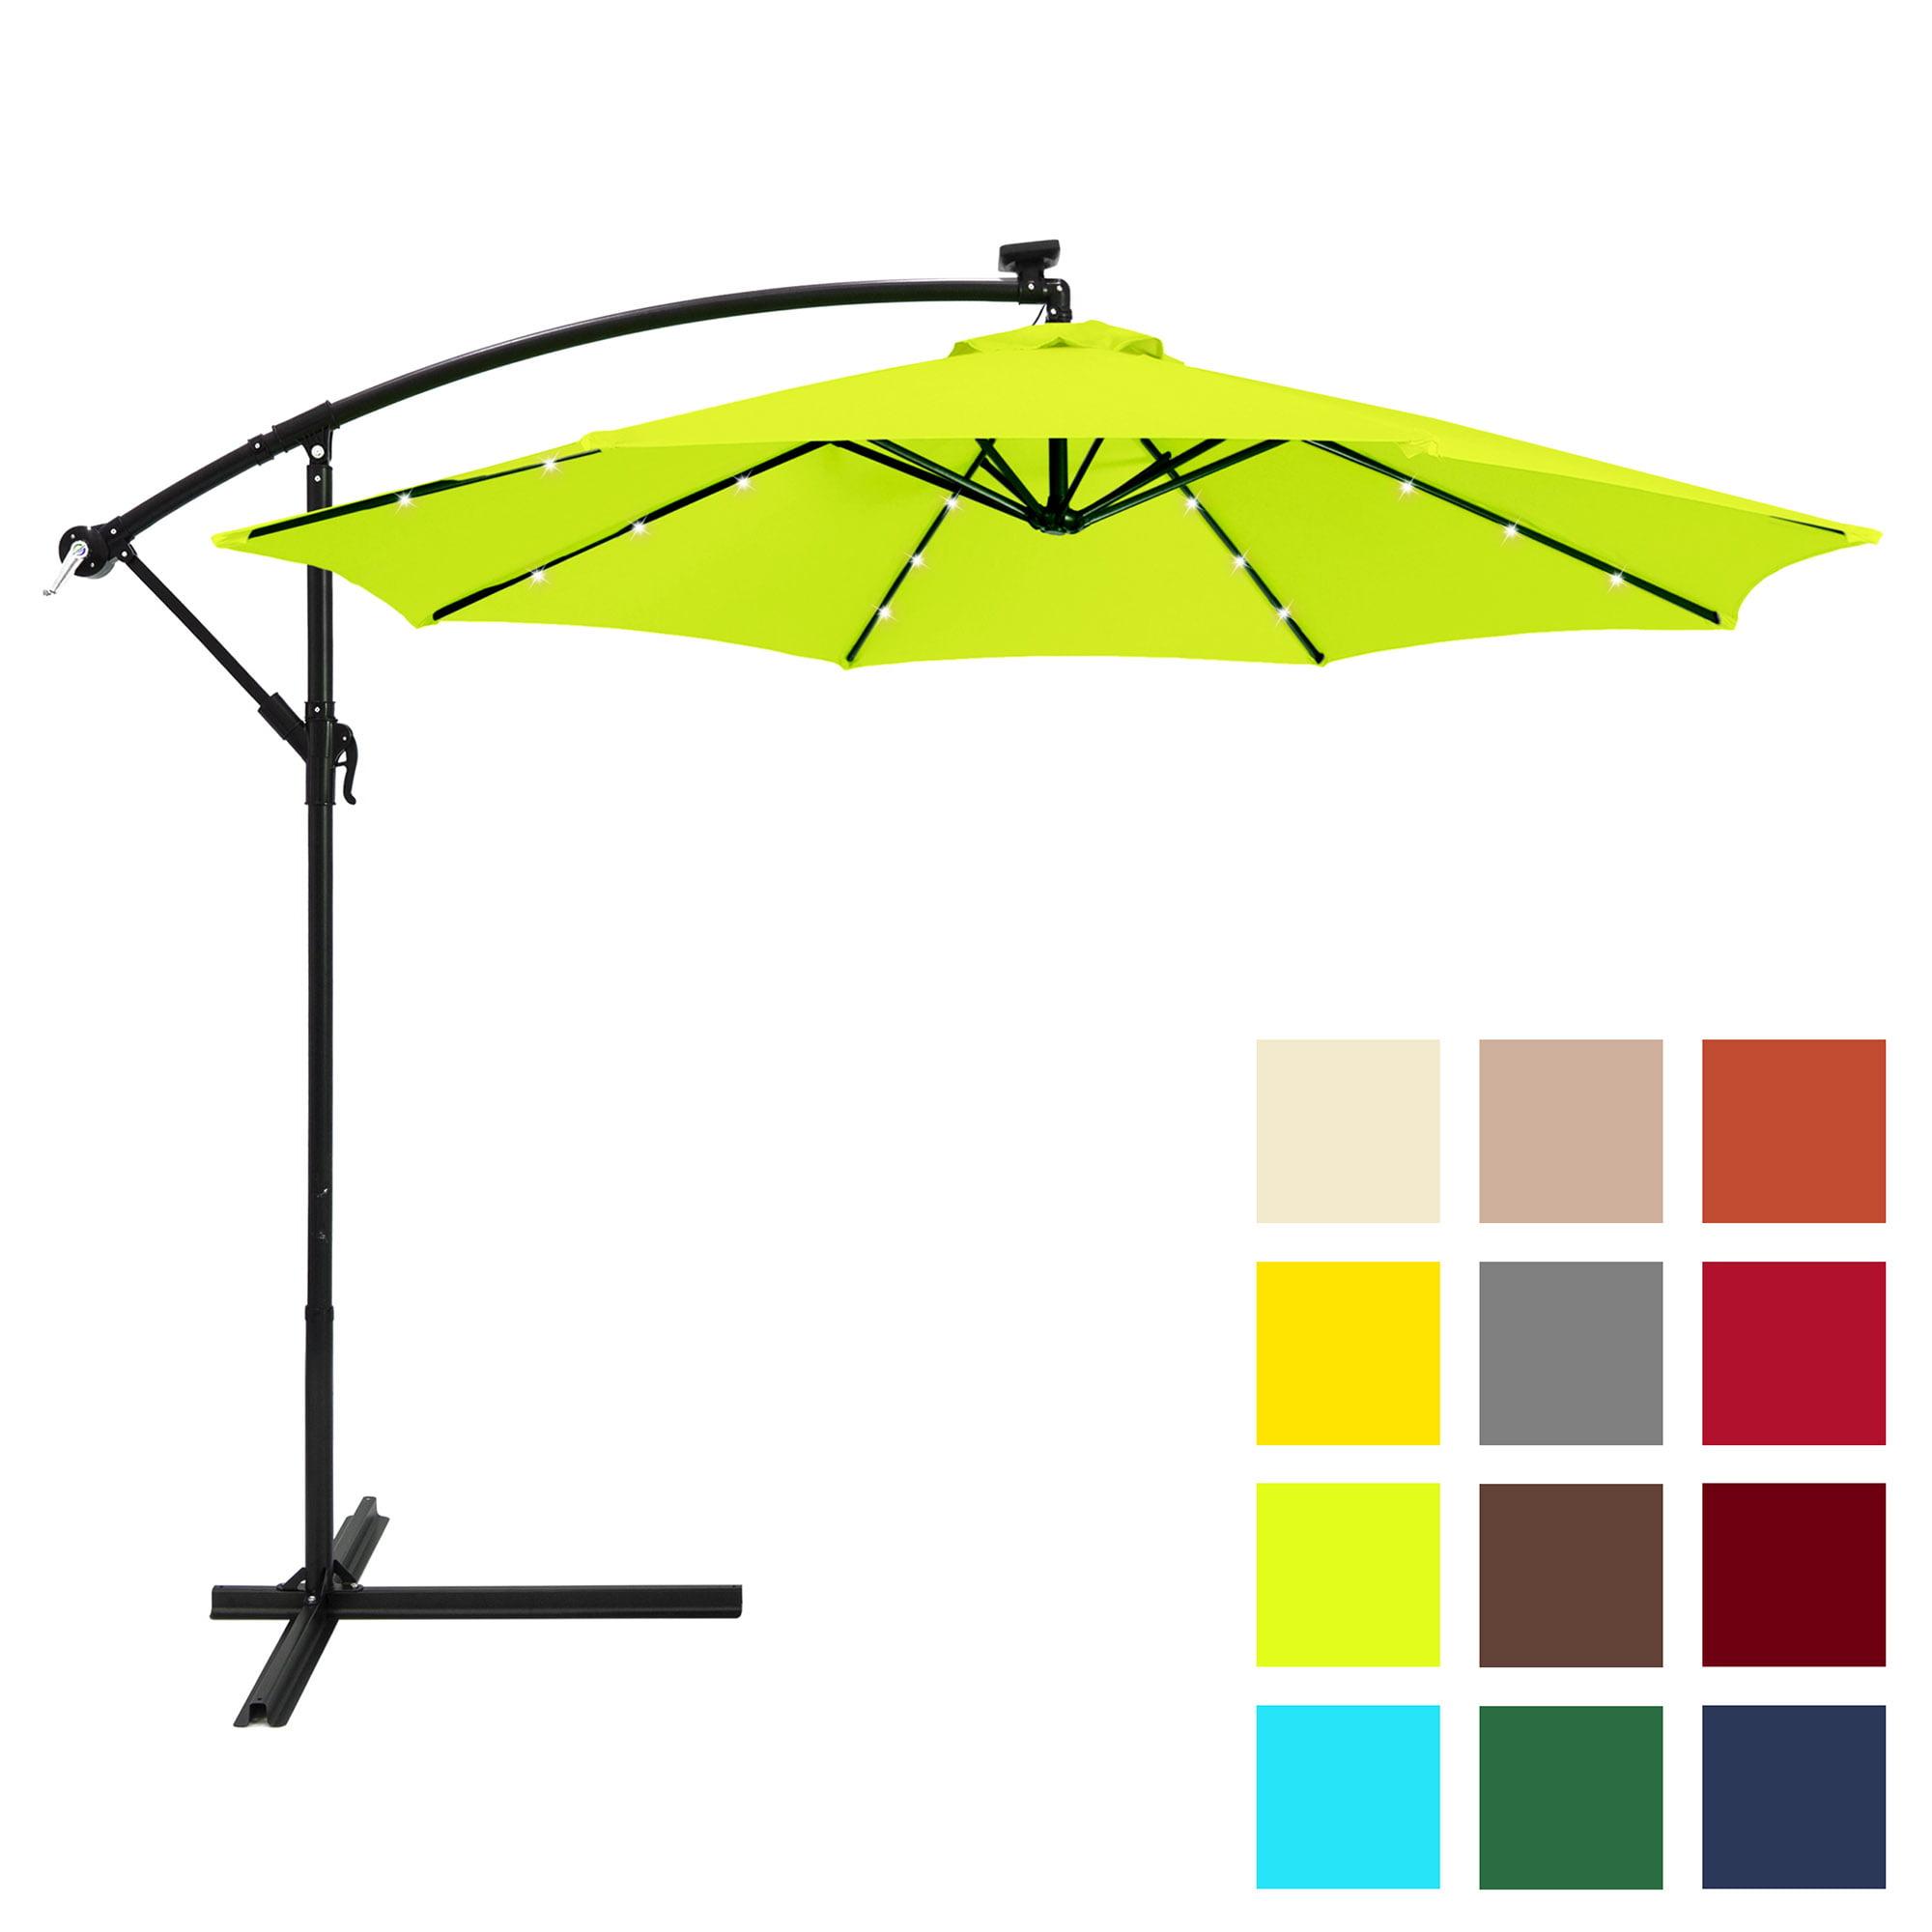 Best Choice Products 10ft Solar LED Patio Offset Umbrella w/ Easy Tilt Adjustment - Light Green